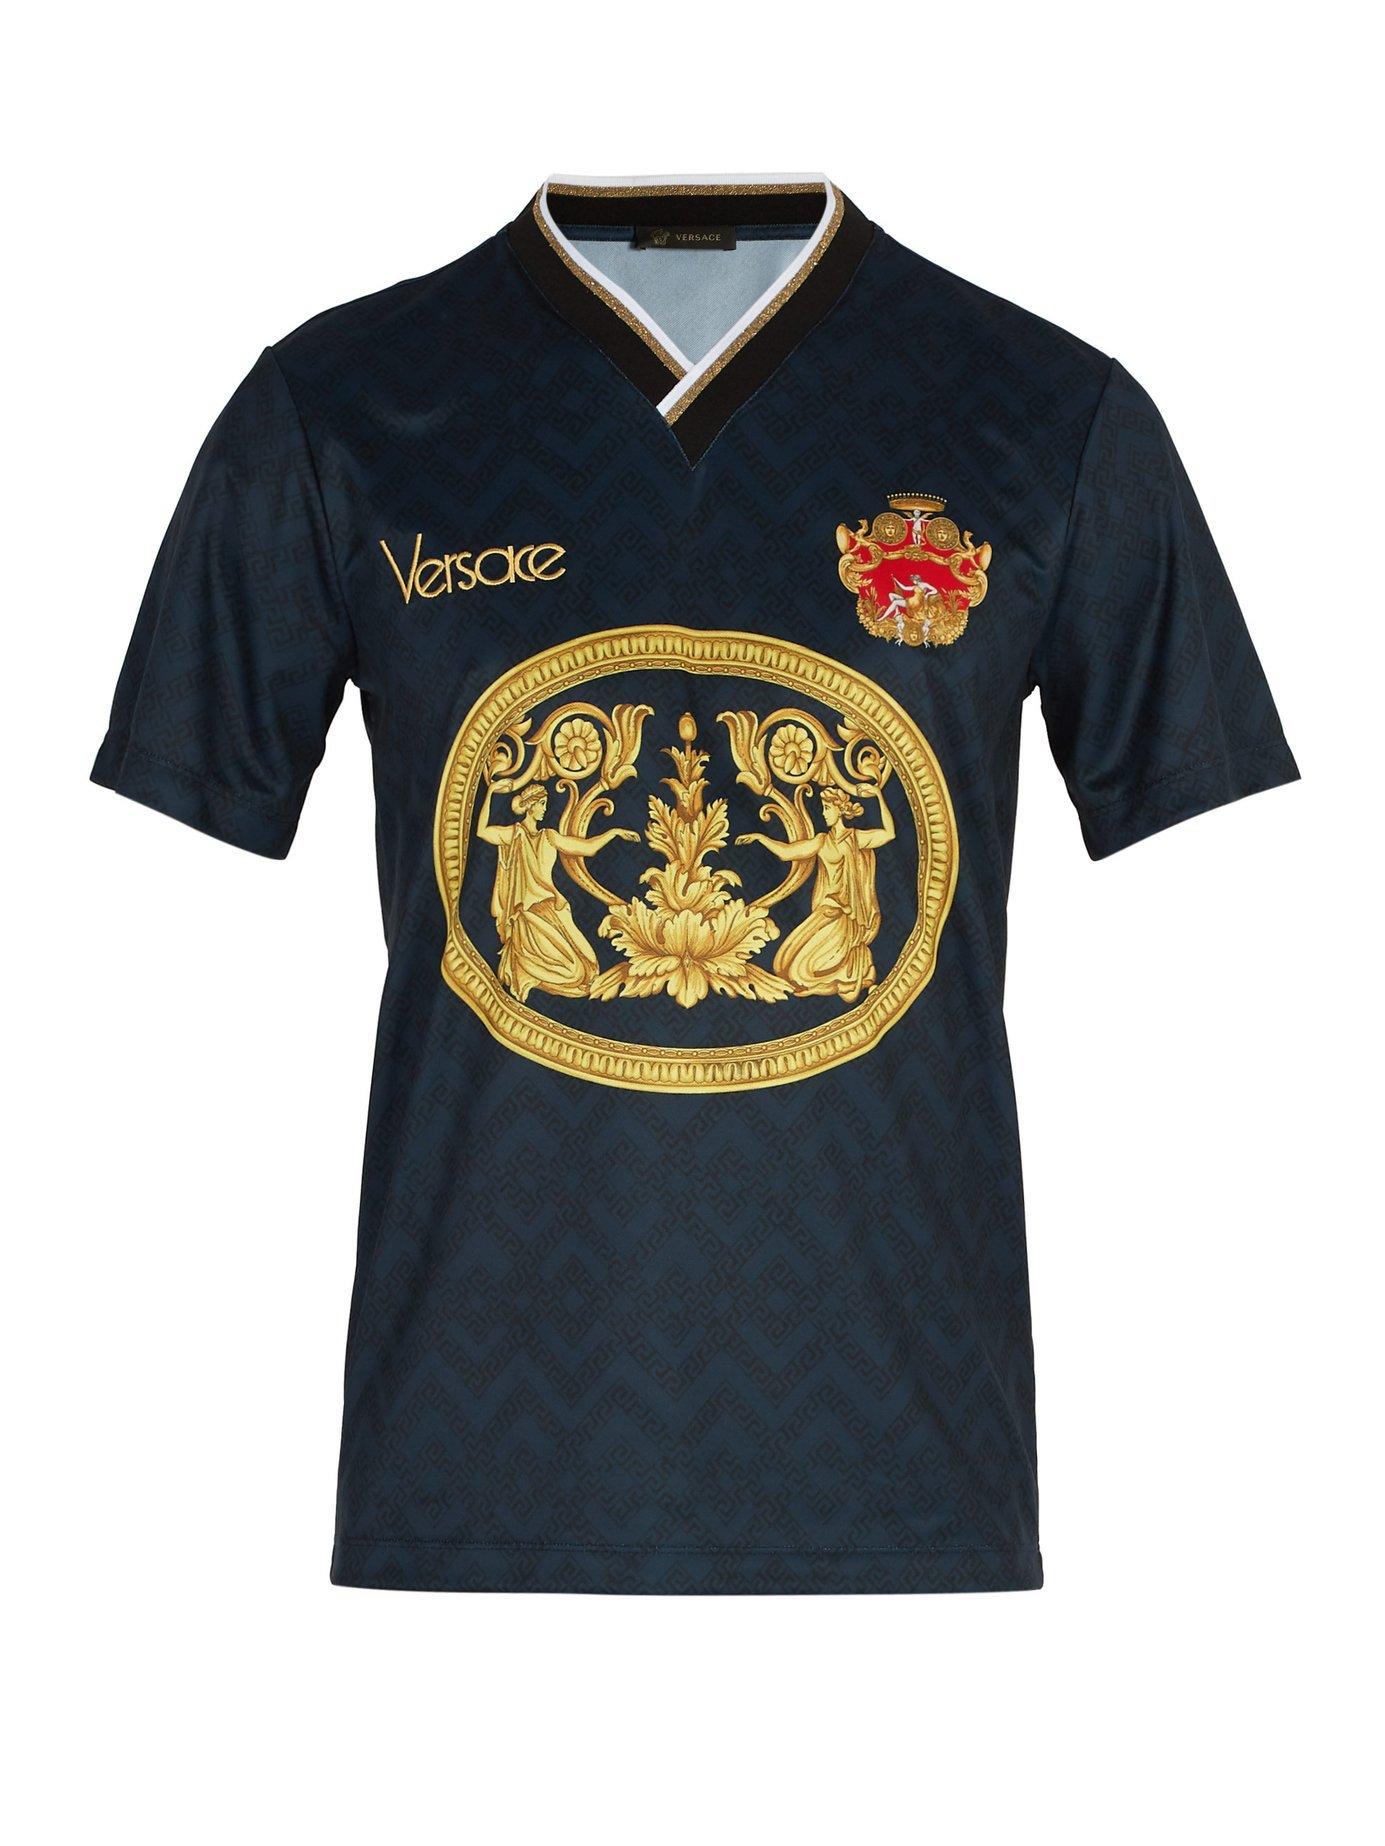 Versace V Neck Football Shirt